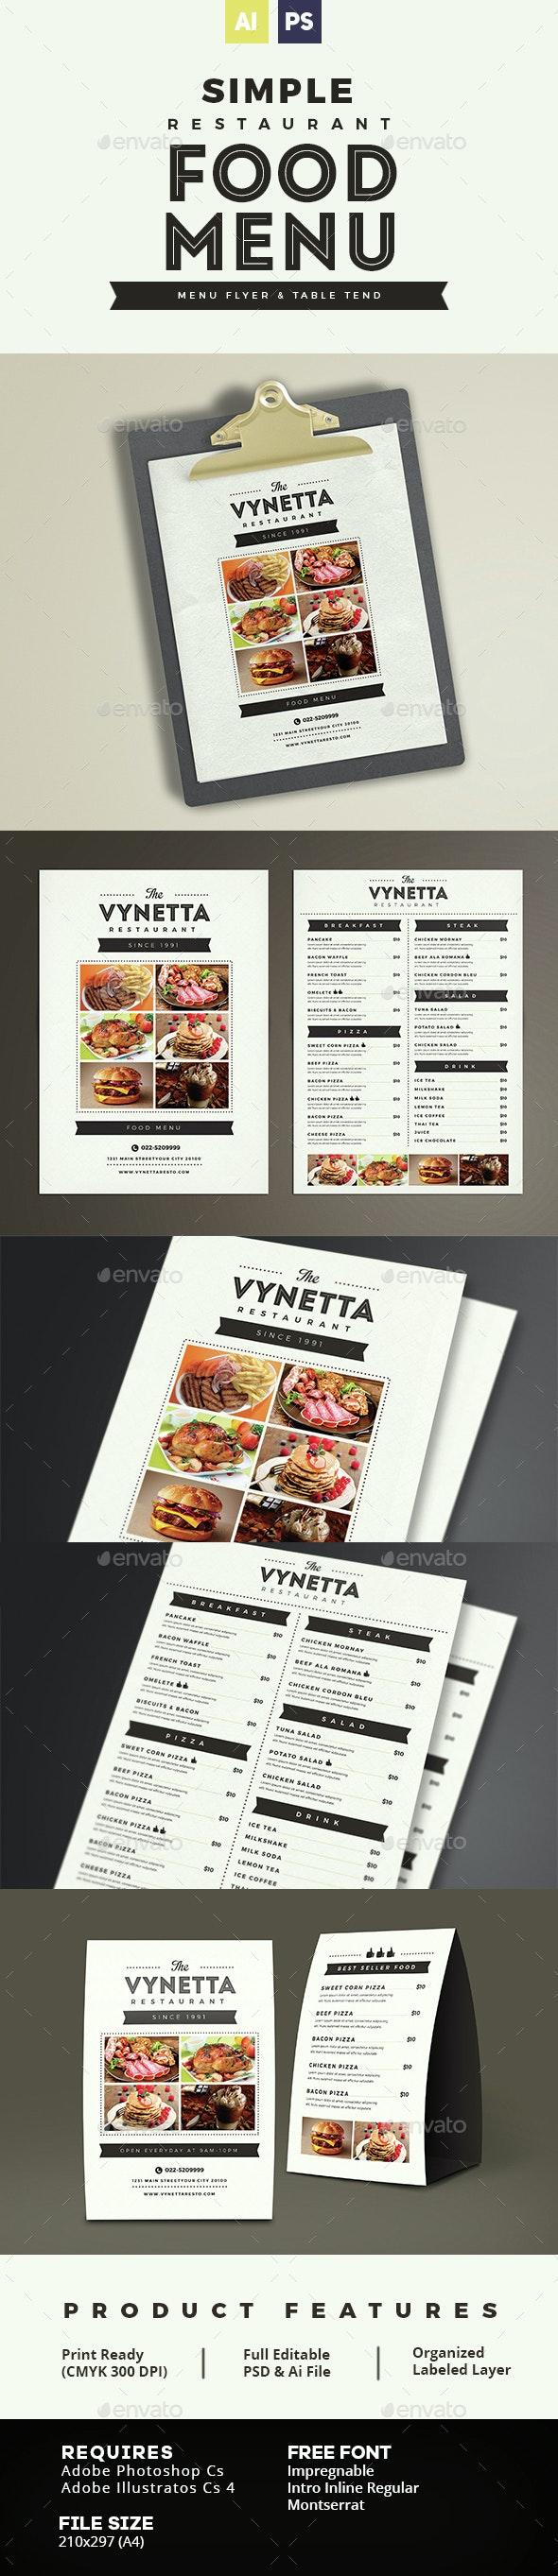 Simple Restaurant Food Menu - Food Menus Print Templates